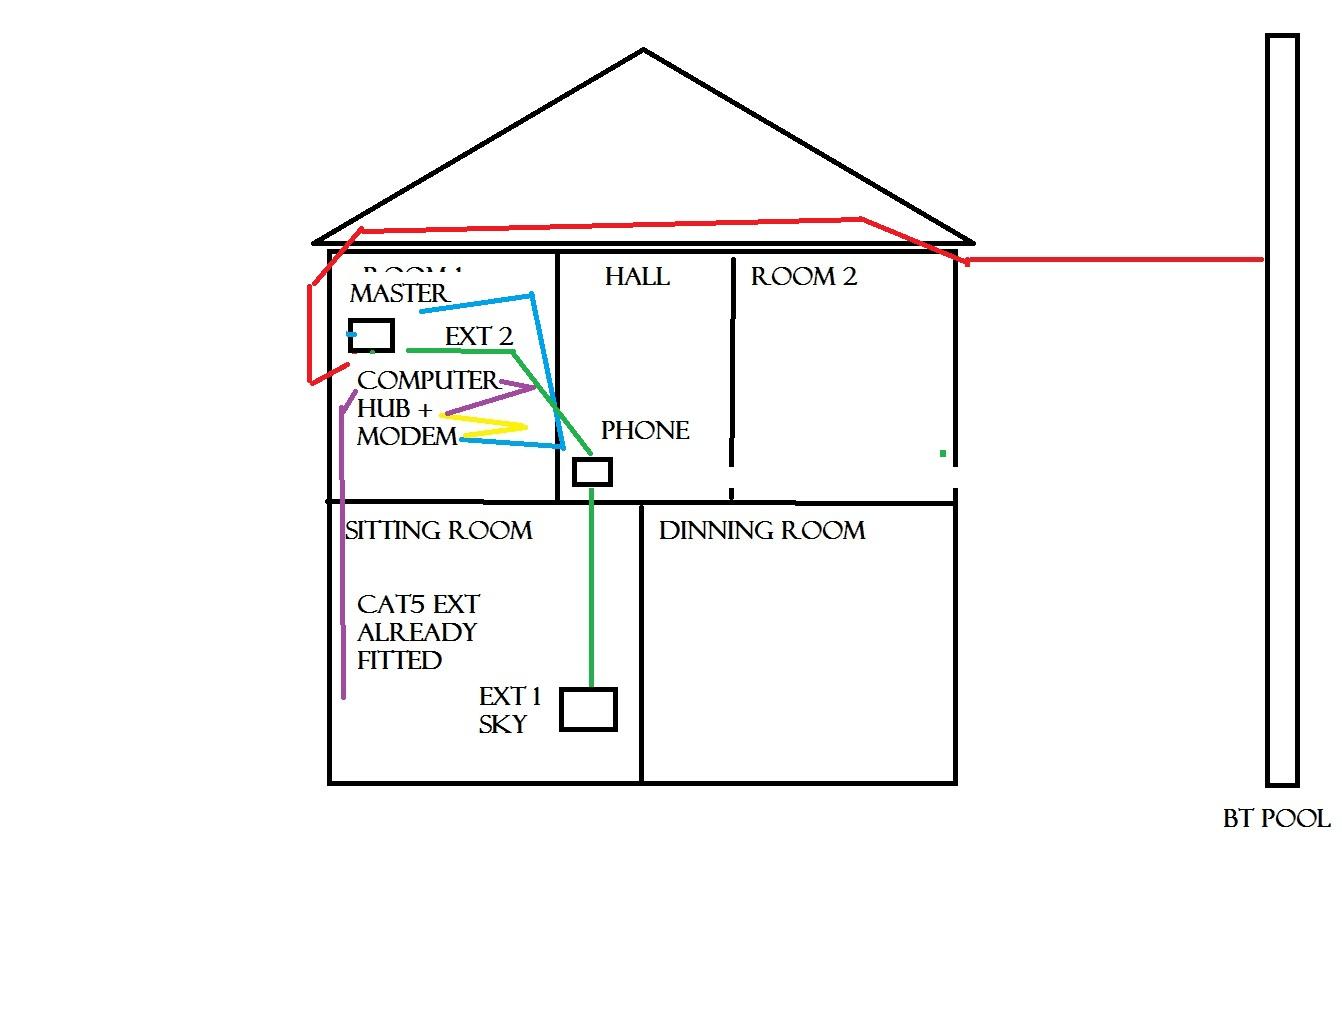 bt house wiring diagram wiring diagram telephone wire rj45 to bt socket wiring diagram